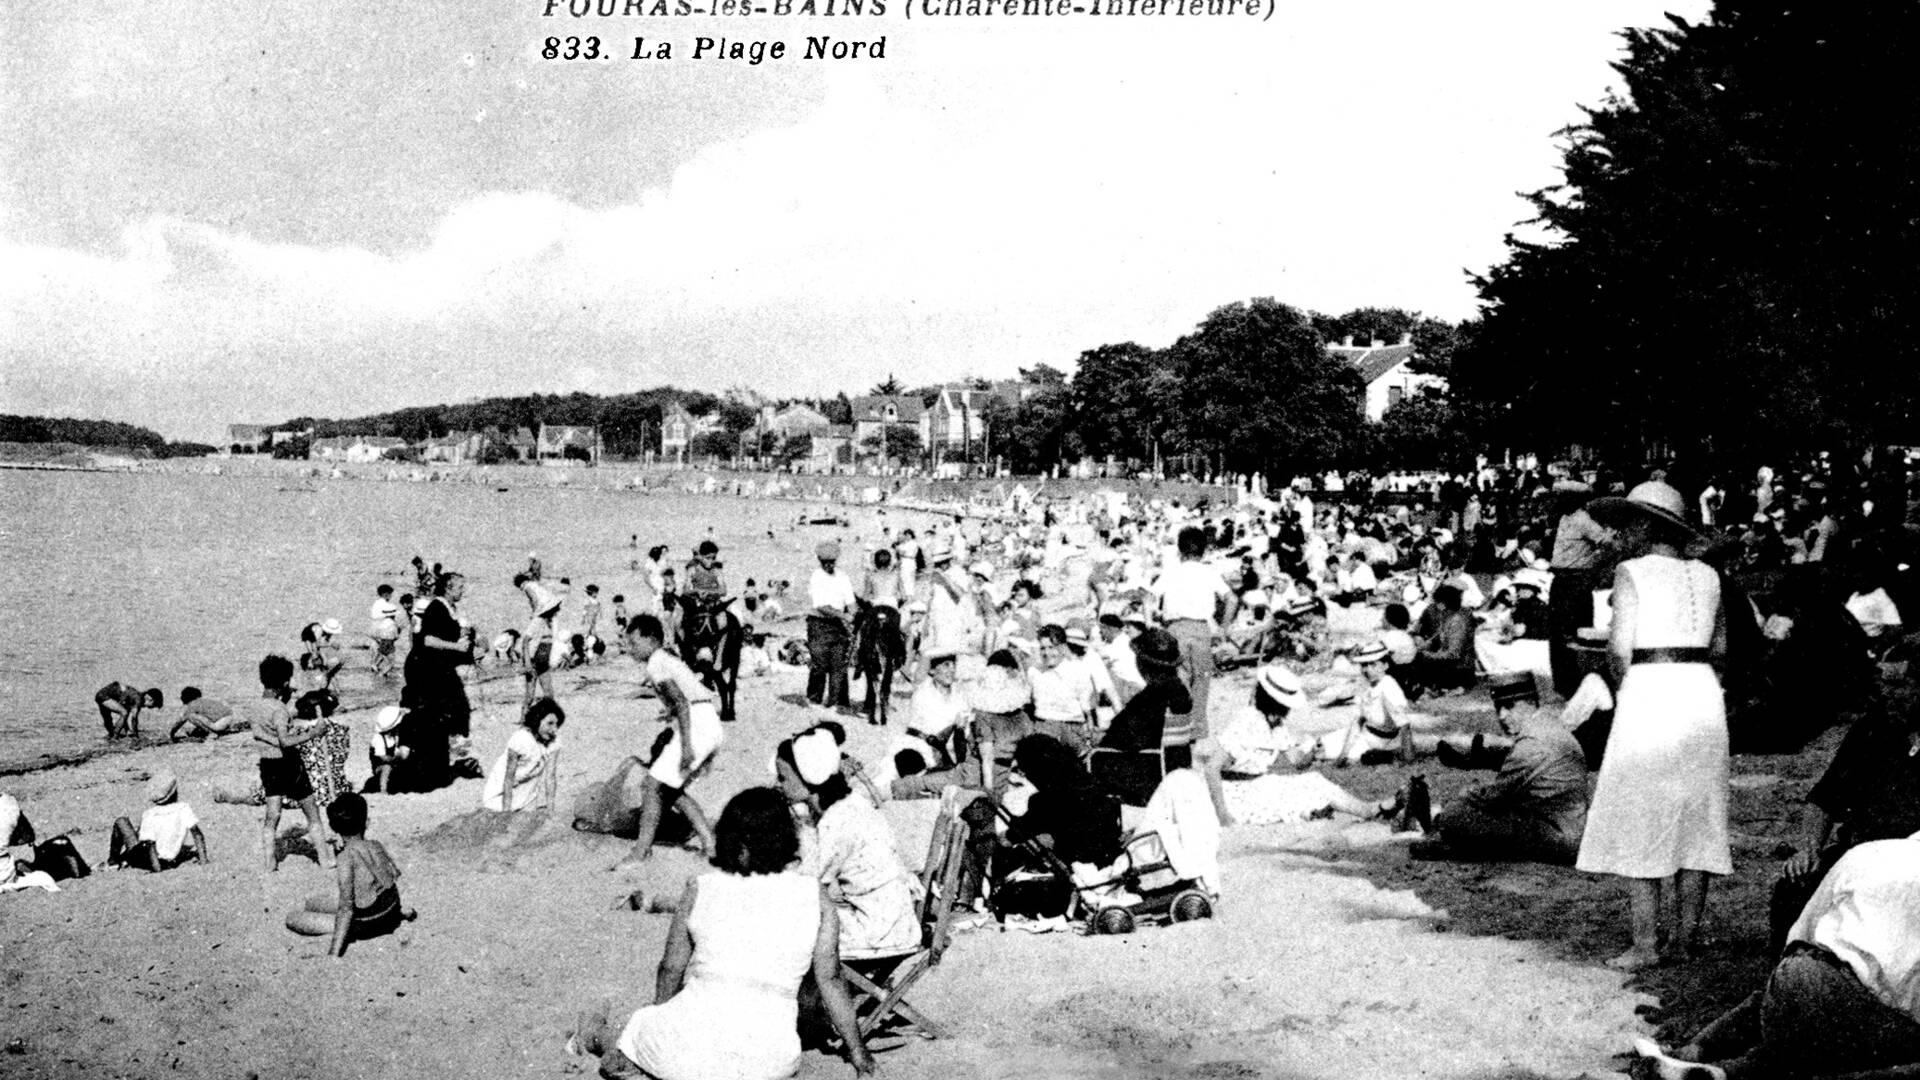 Fouras-les-Bains, Grande Plage, Rochefort Océan